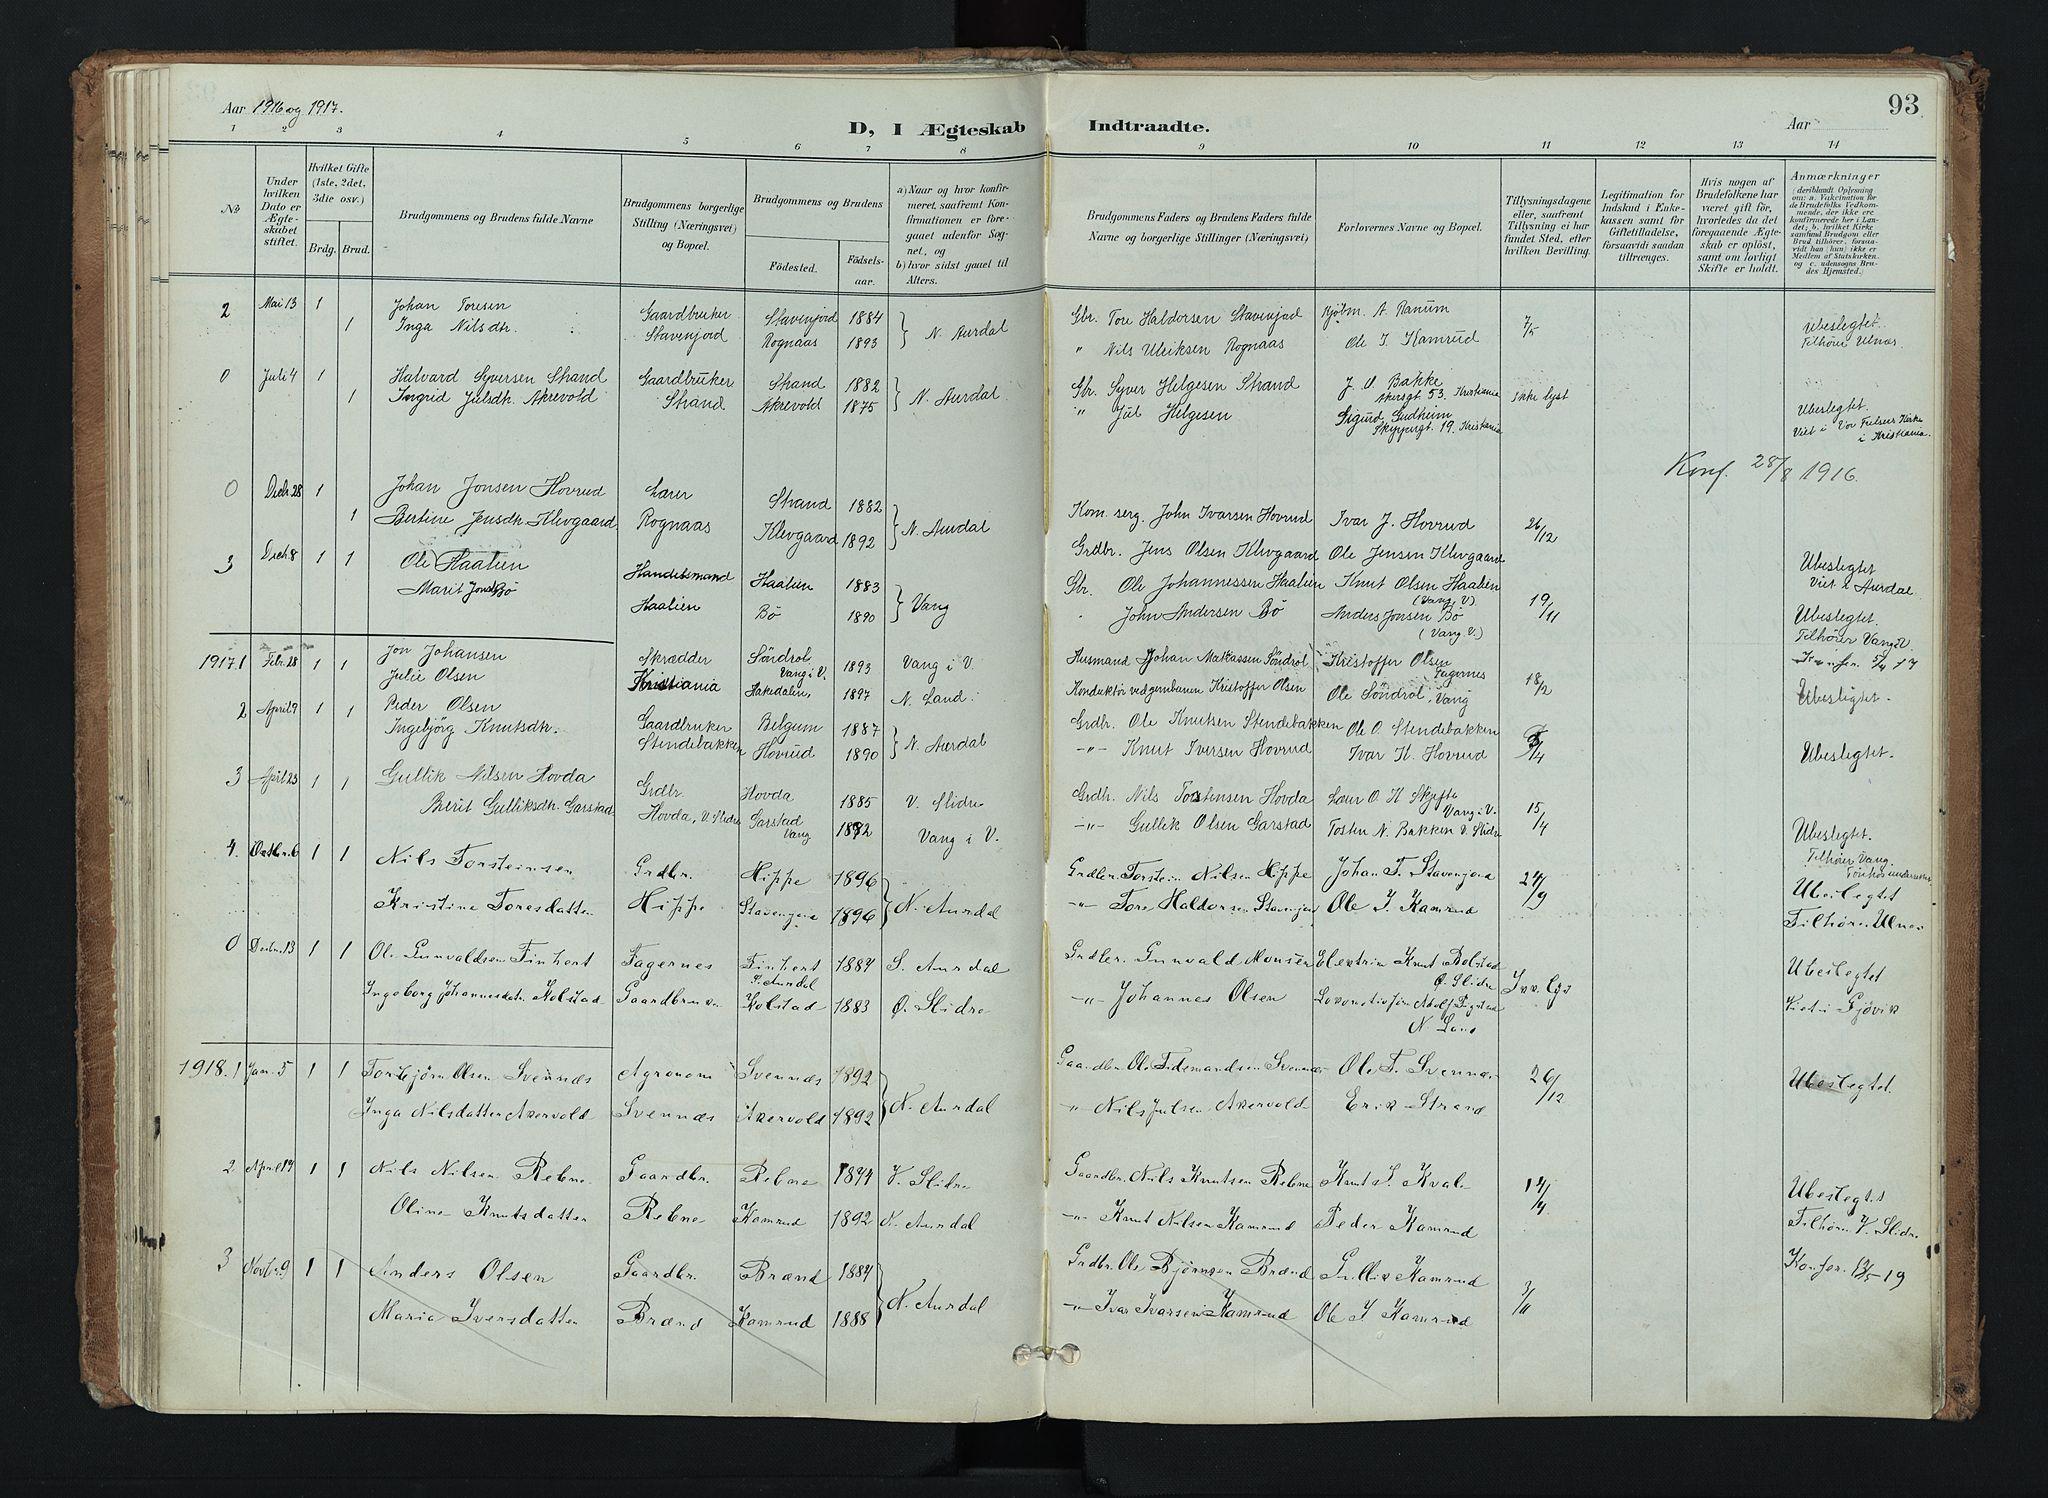 SAH, Nord-Aurdal prestekontor, Ministerialbok nr. 16, 1897-1925, s. 93